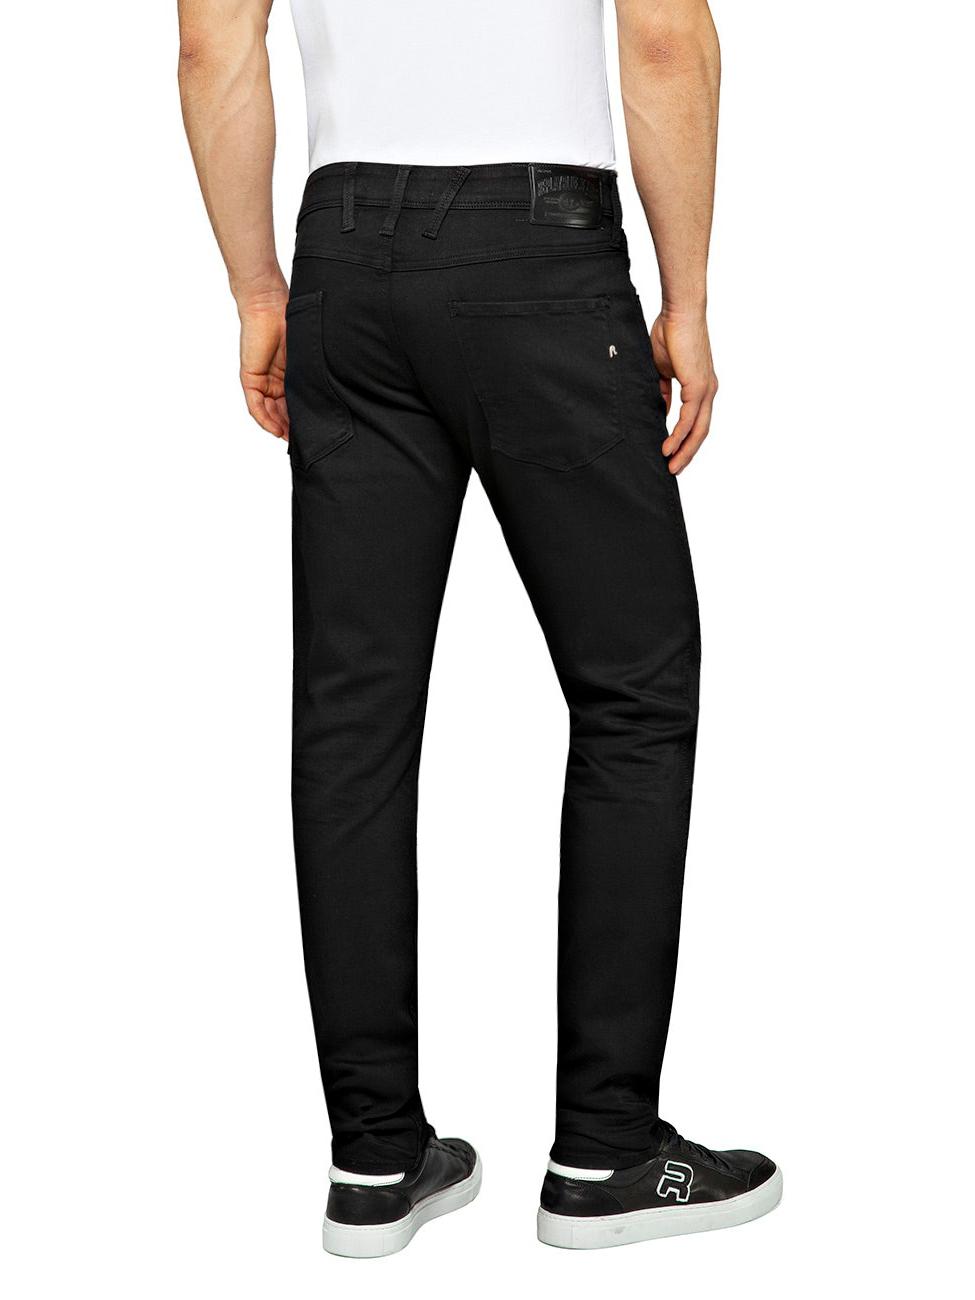 replay-herren-jeans-anbass-slim-fit-schwarz-black, 89.10 EUR @ jeans